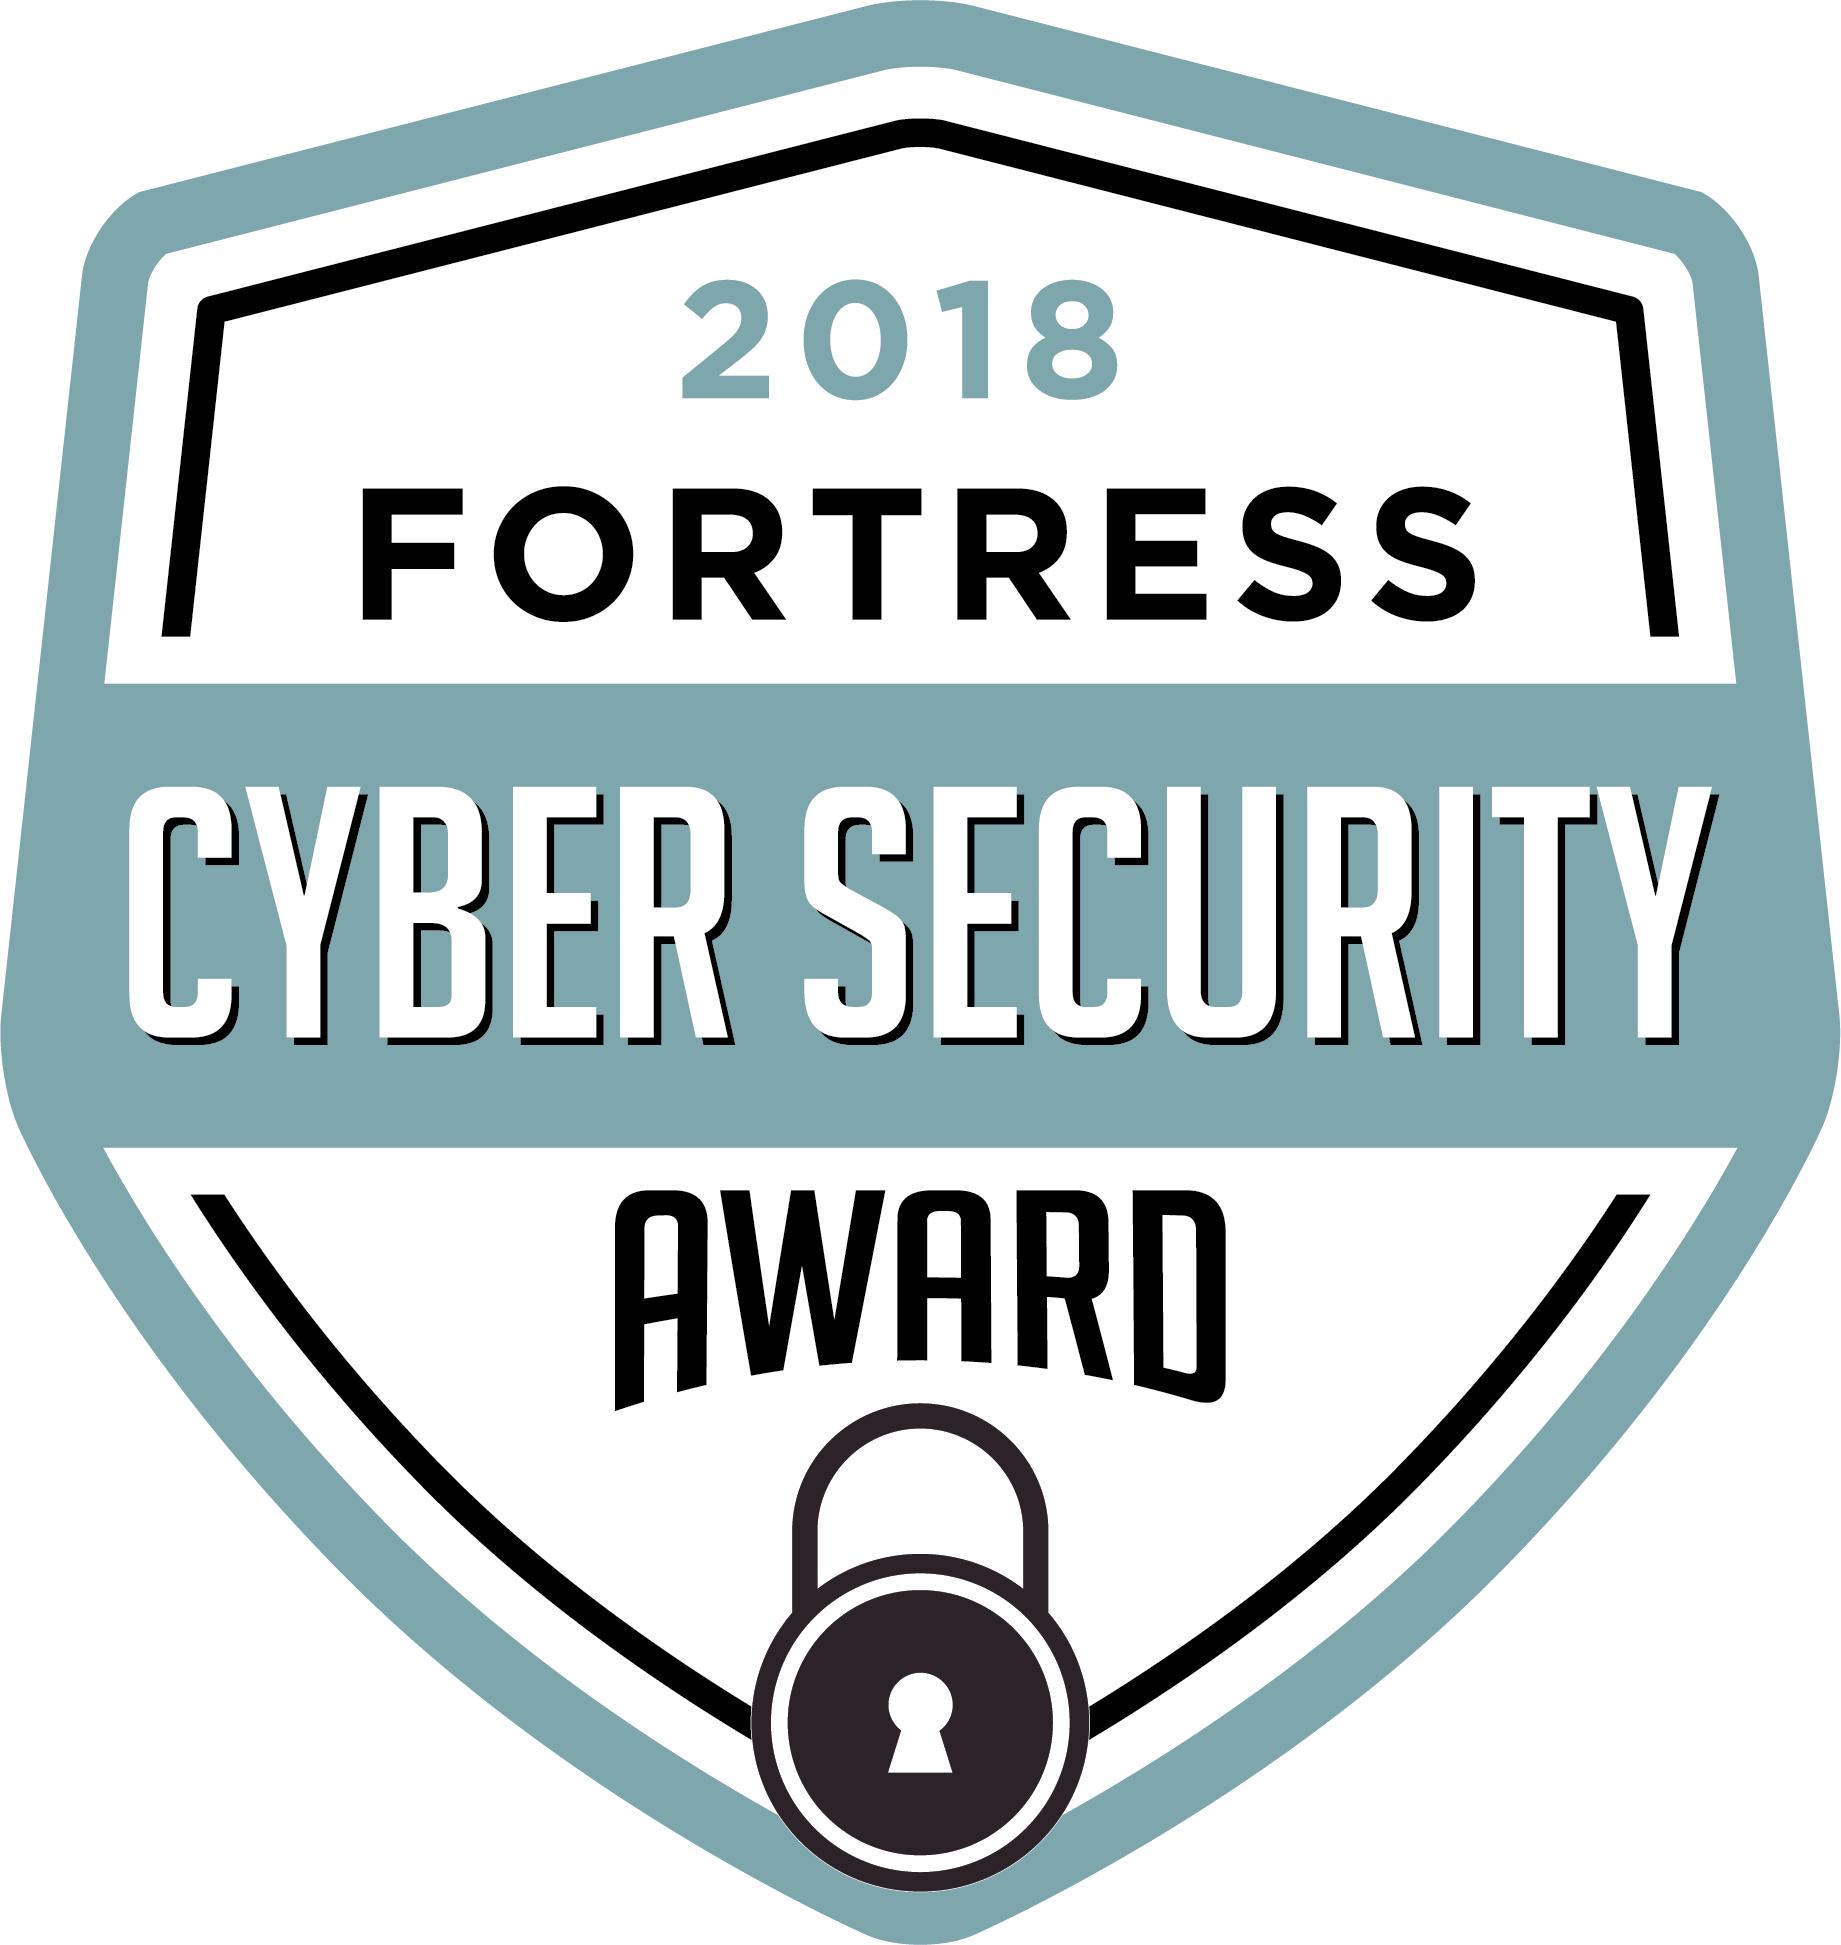 CyberSecurityAward-2018